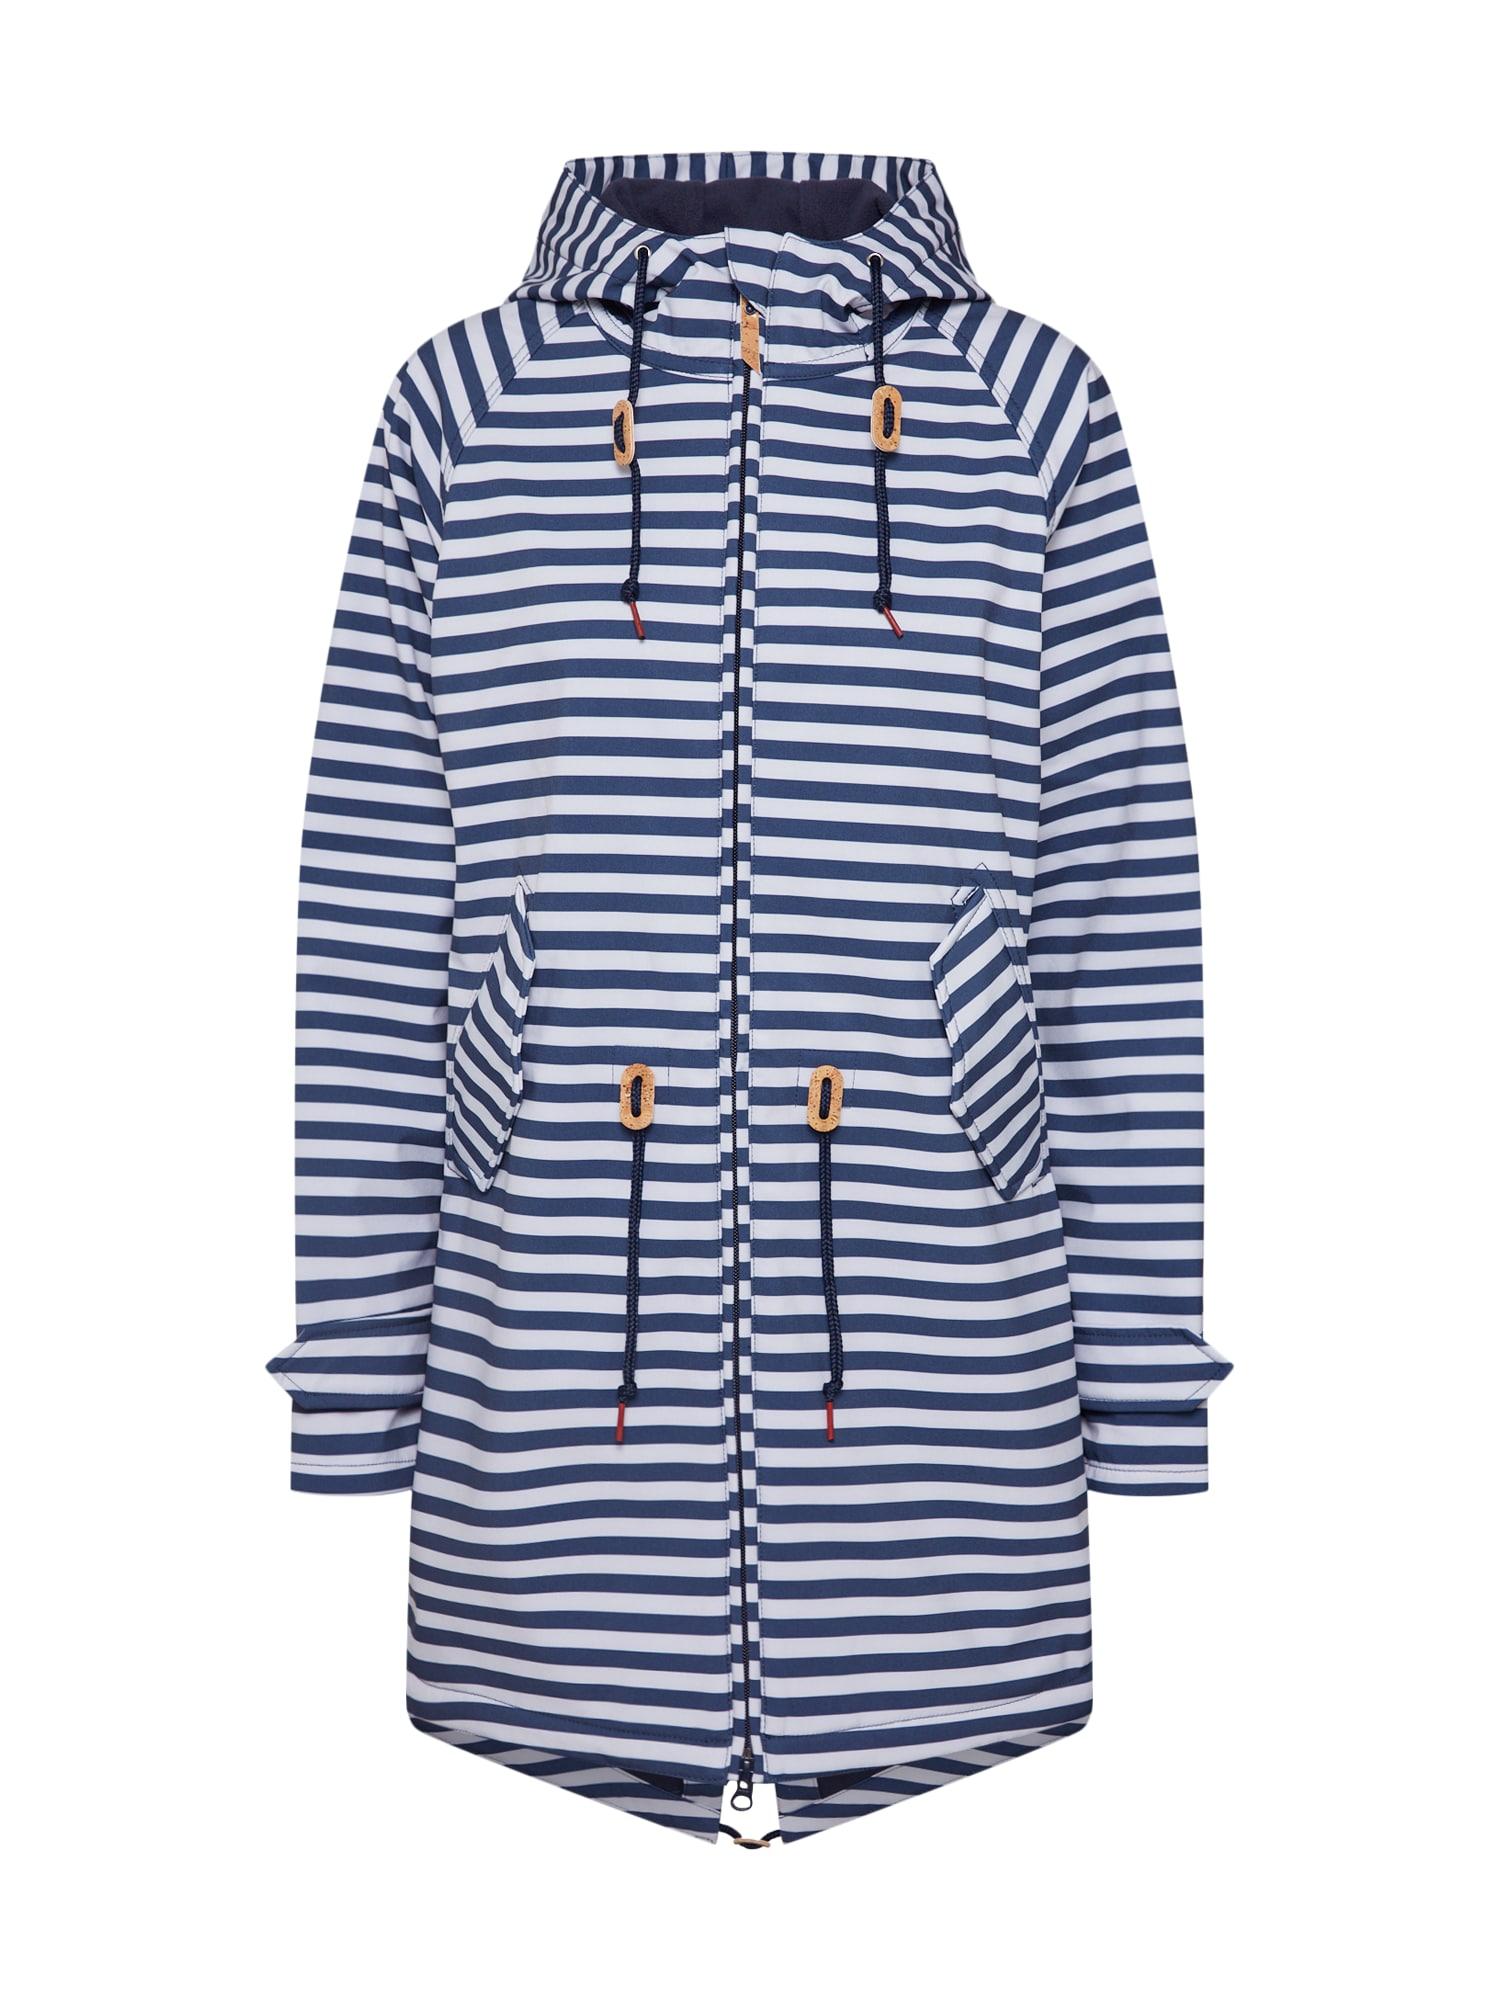 Přechodný kabát Island Friese blau navy weiß Derbe